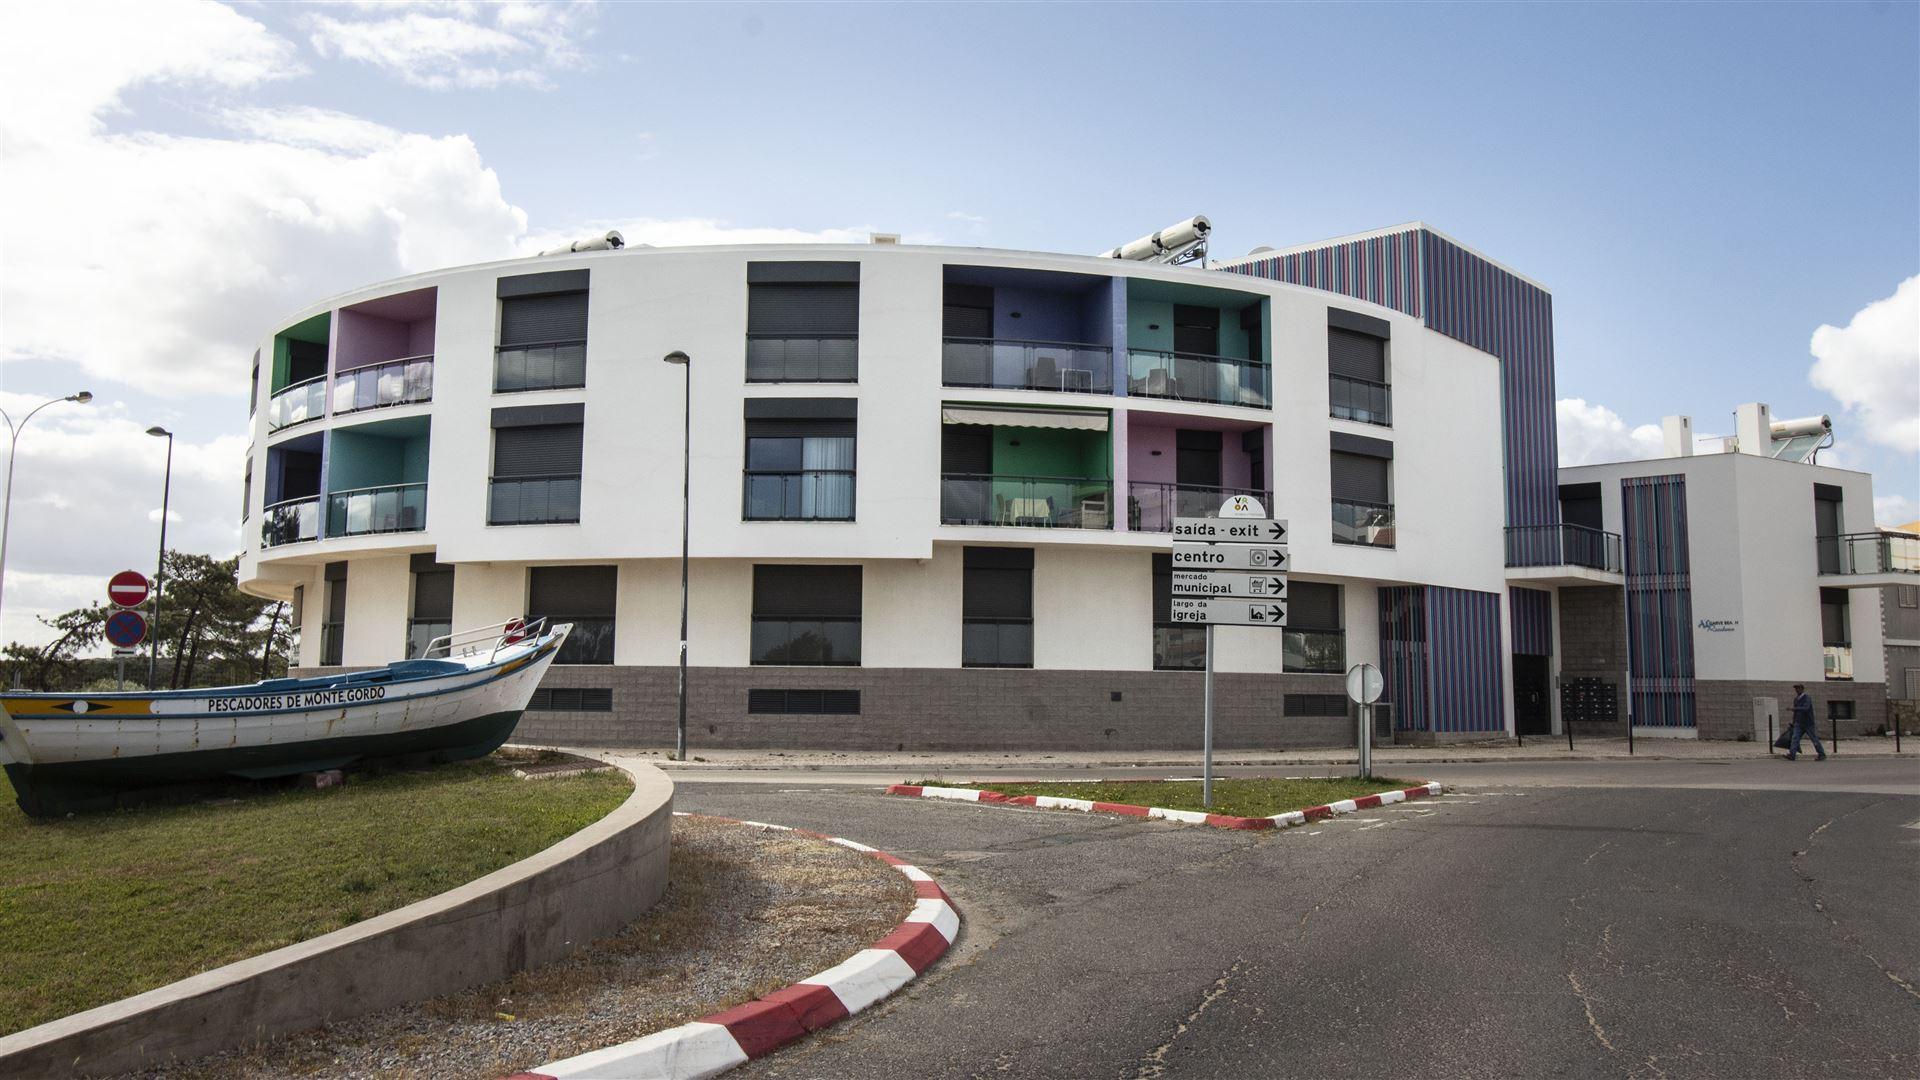 Wohnung 2 Schlafzimmer - Algarve, Monte Gordo, Vila Real de Santo António